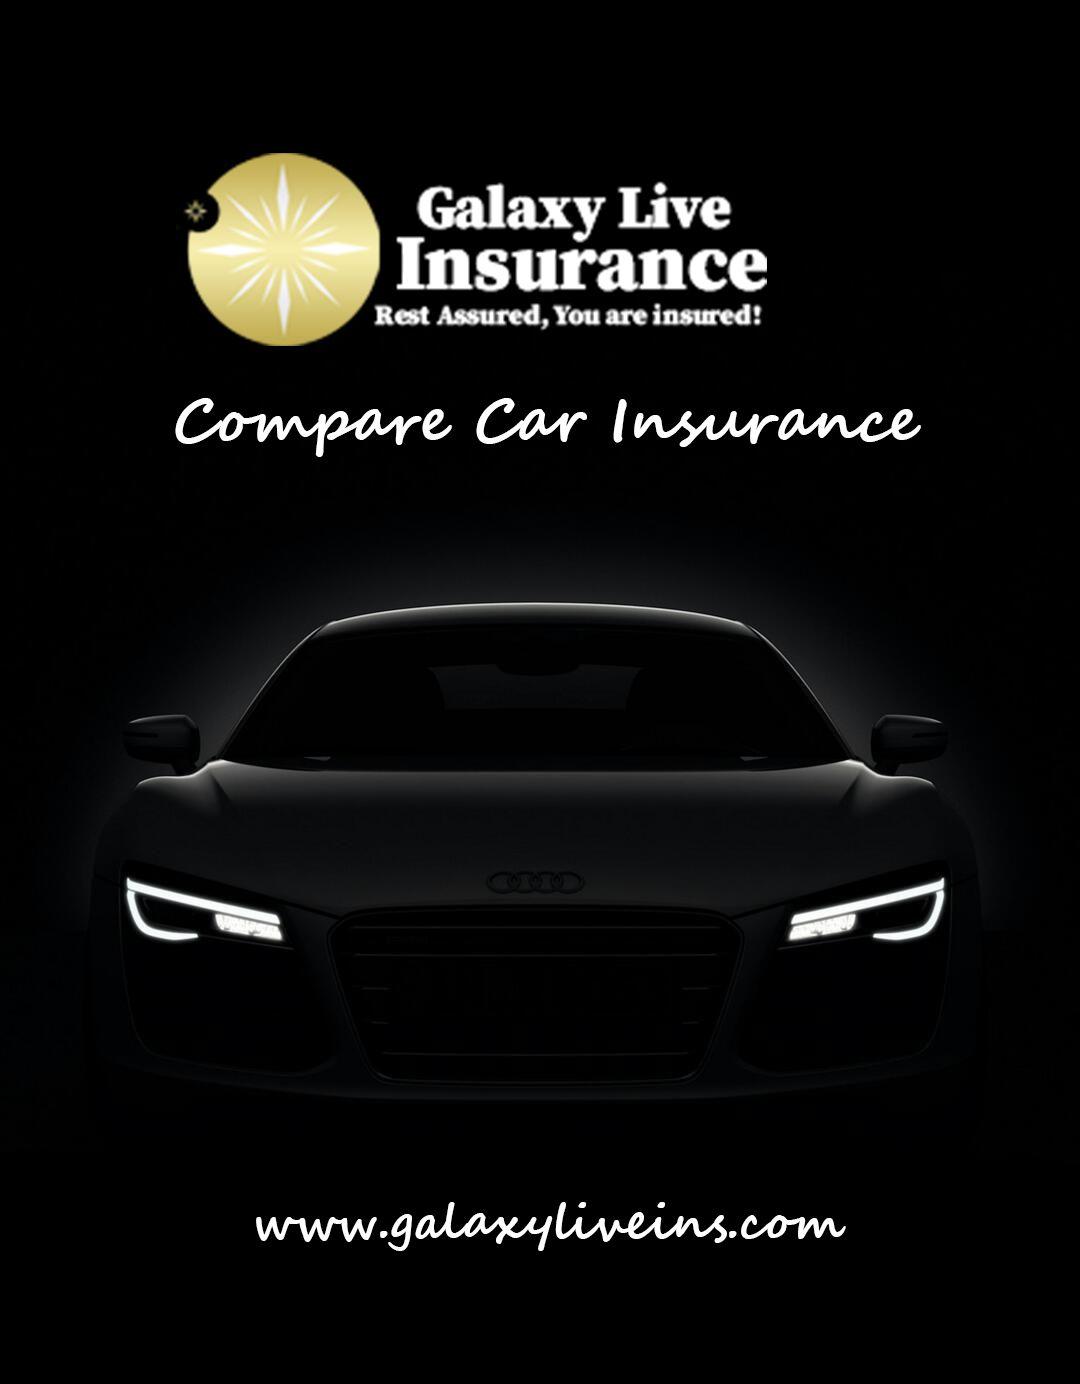 Compare Car Insurance Car Insurance Compare Car Insurance Car Insurance Online